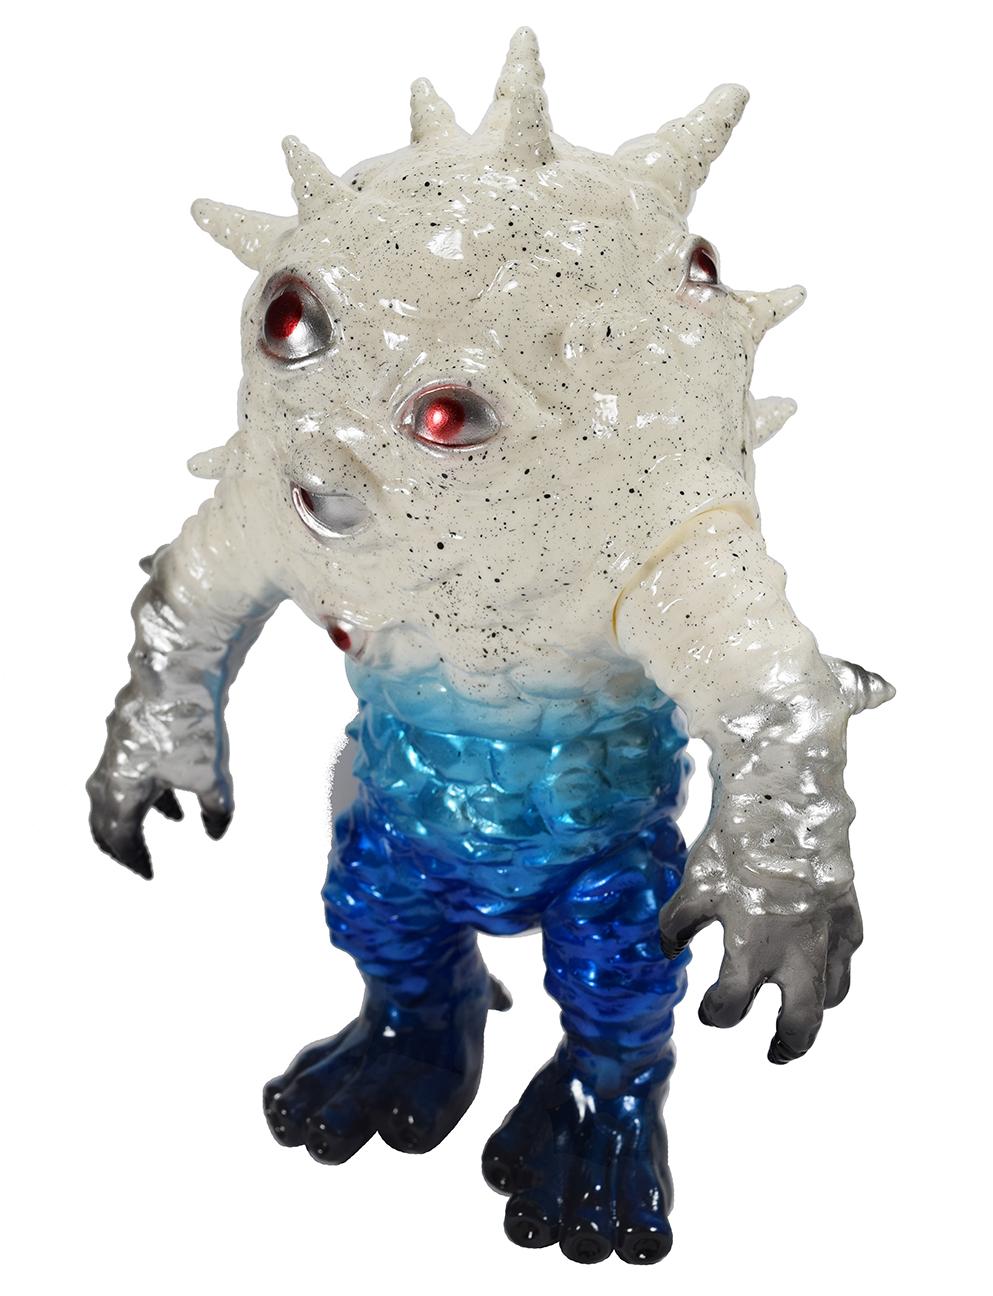 Black Snow Kaiju Eyezon Max Nagata custom painted